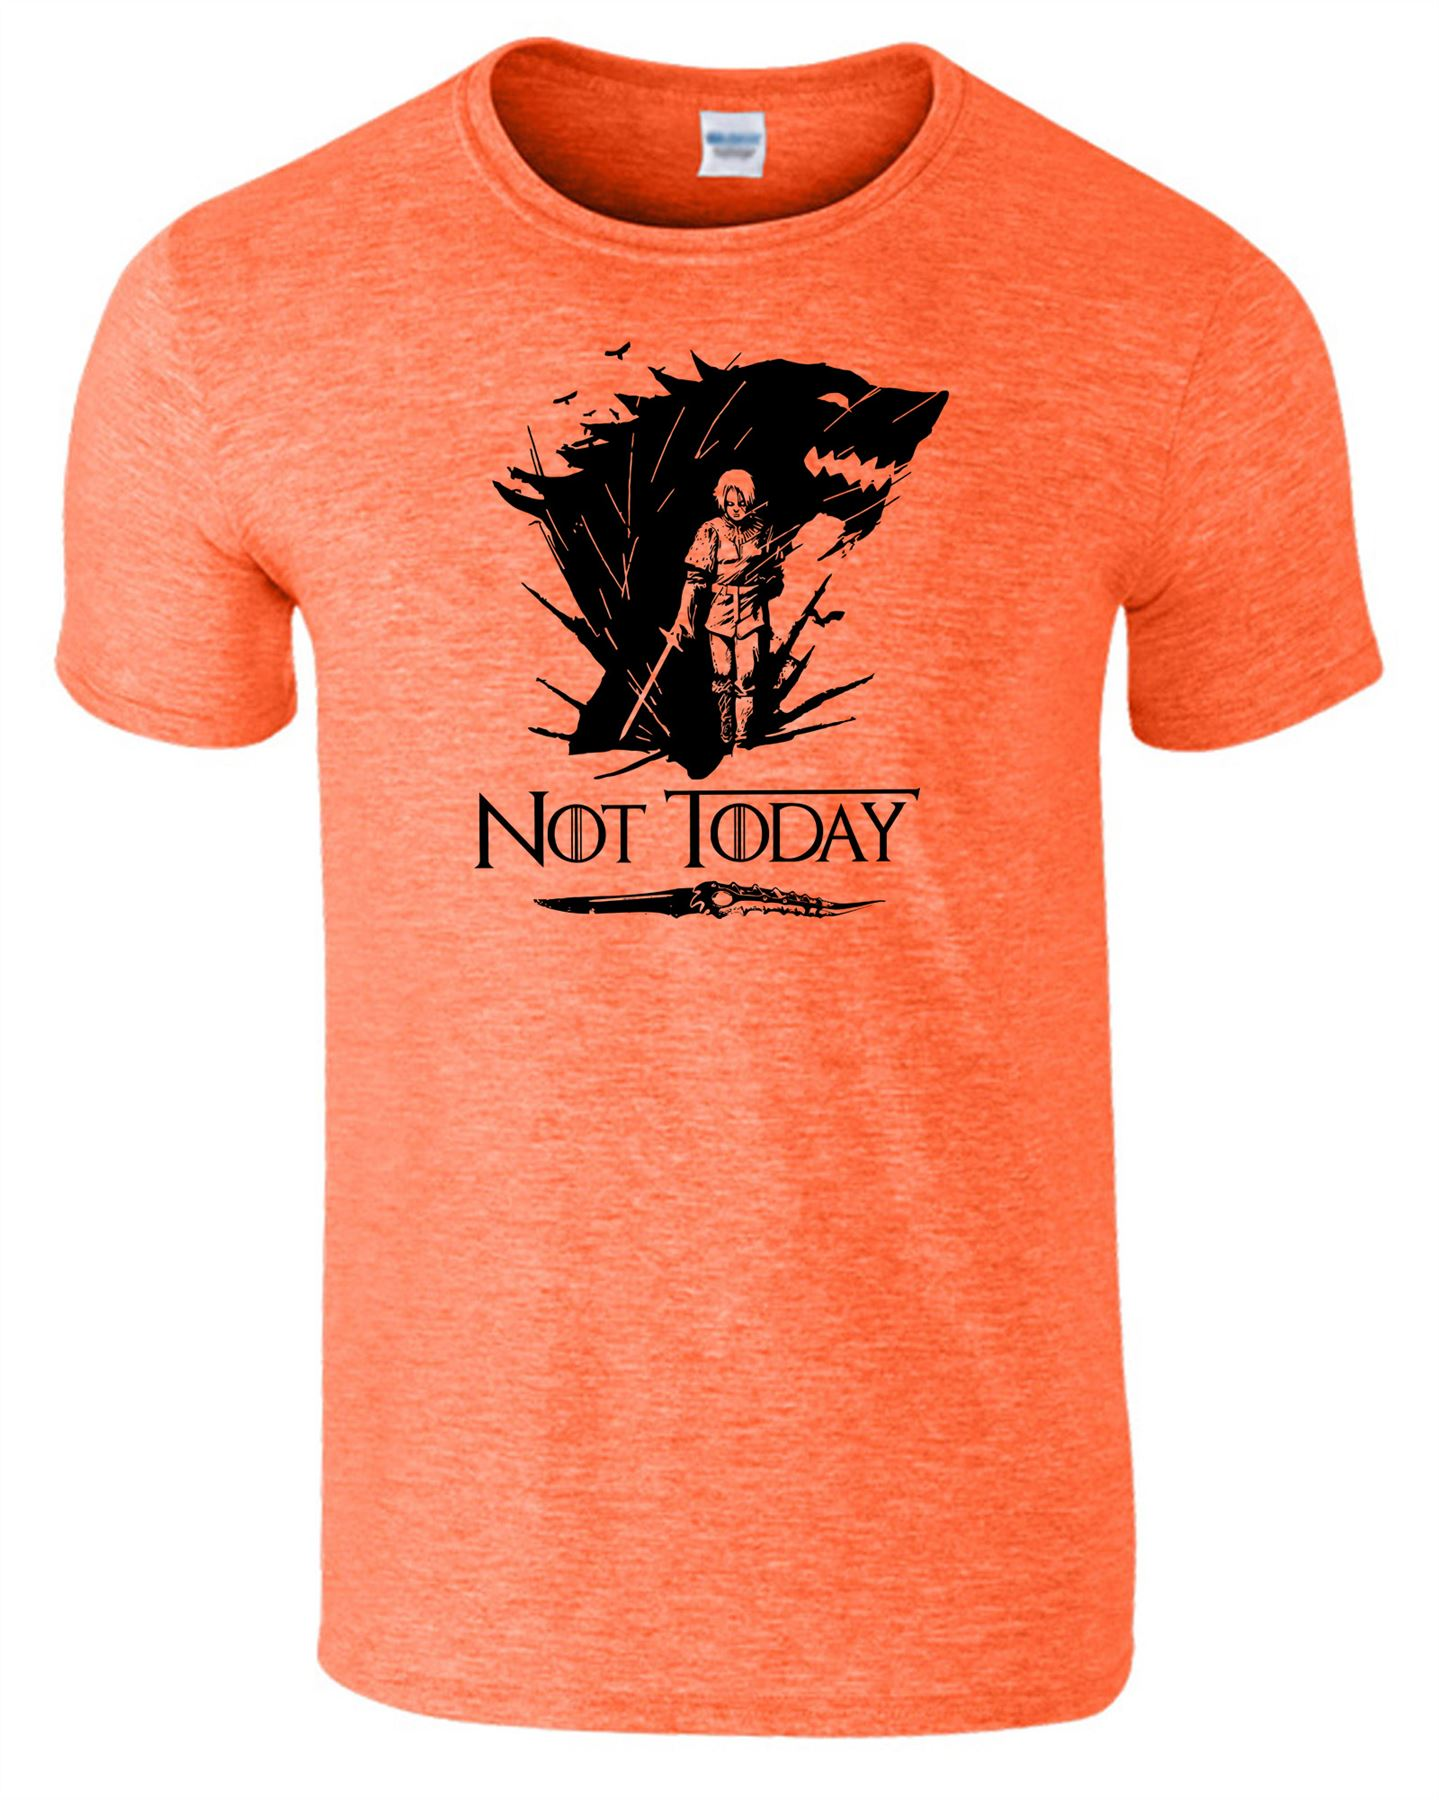 Arya-Stark-Not-Today-T-Shirt-Mens-Game-Season-Womens-Shirt-Adults-Unisex-Fit Indexbild 17